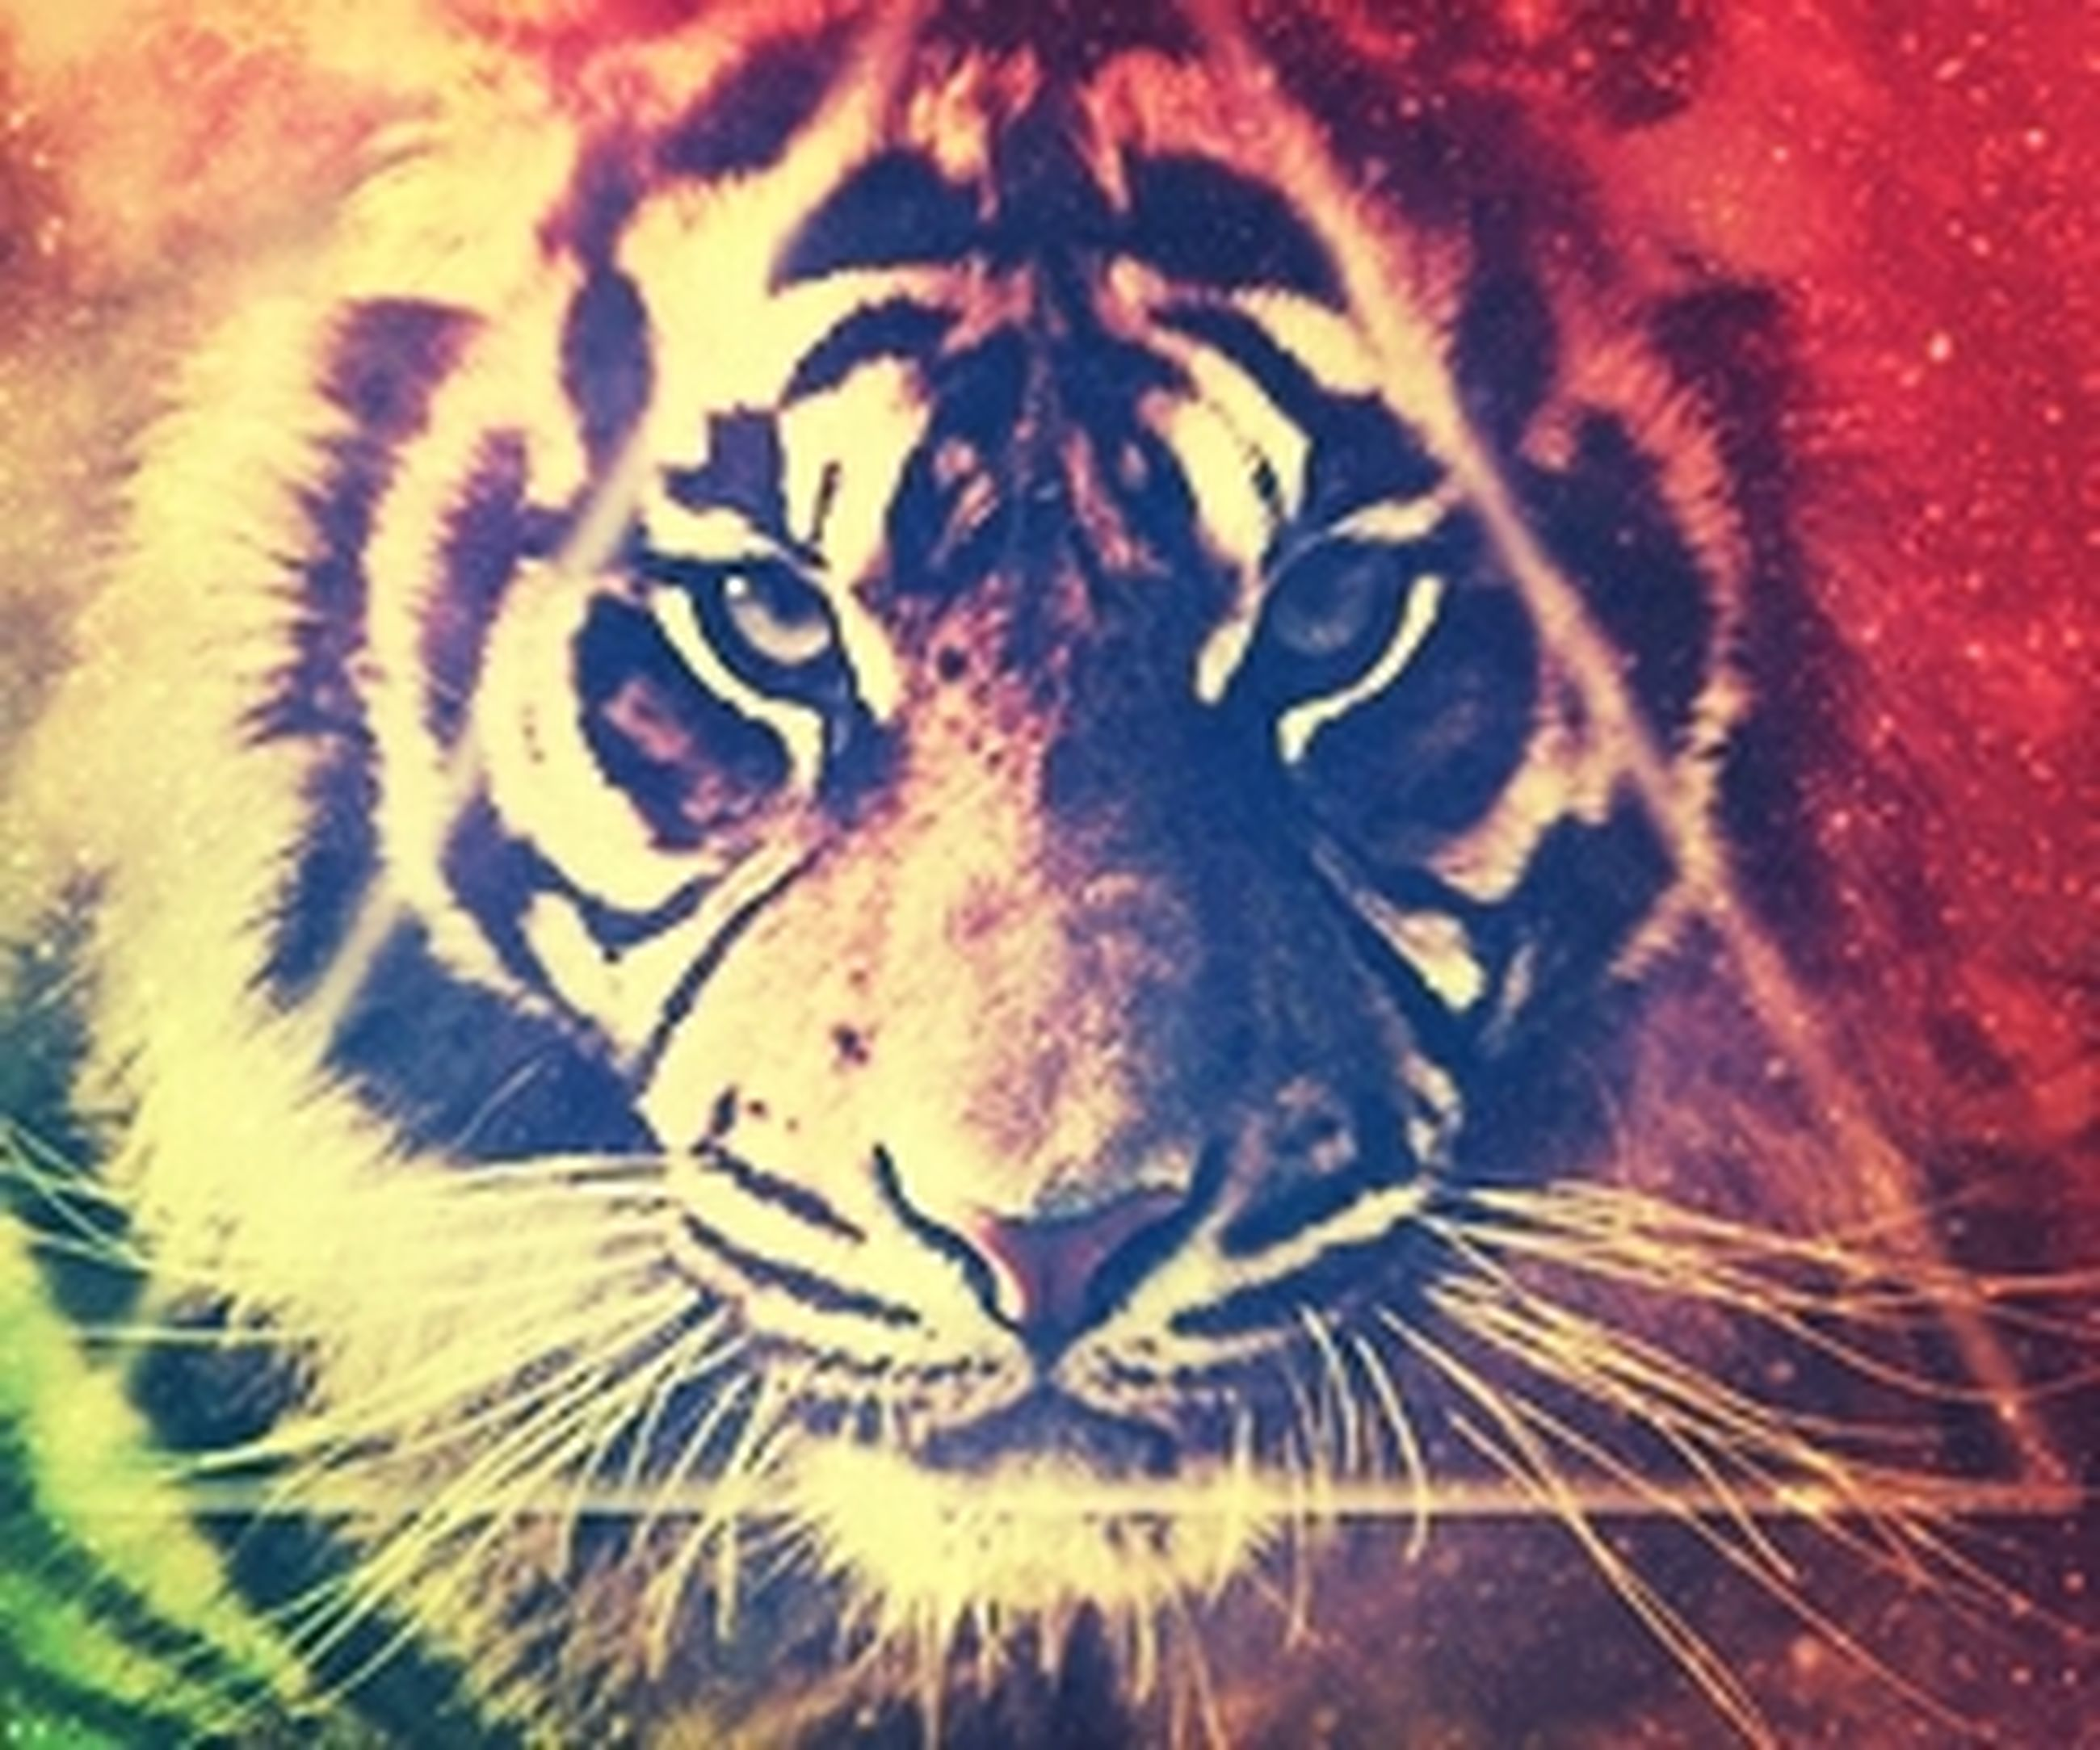 creativity, art and craft, art, animal themes, close-up, pattern, natural pattern, one animal, full frame, no people, animal markings, striped, backgrounds, wildlife, zebra, outdoors, design, animal body part, graffiti, animal head